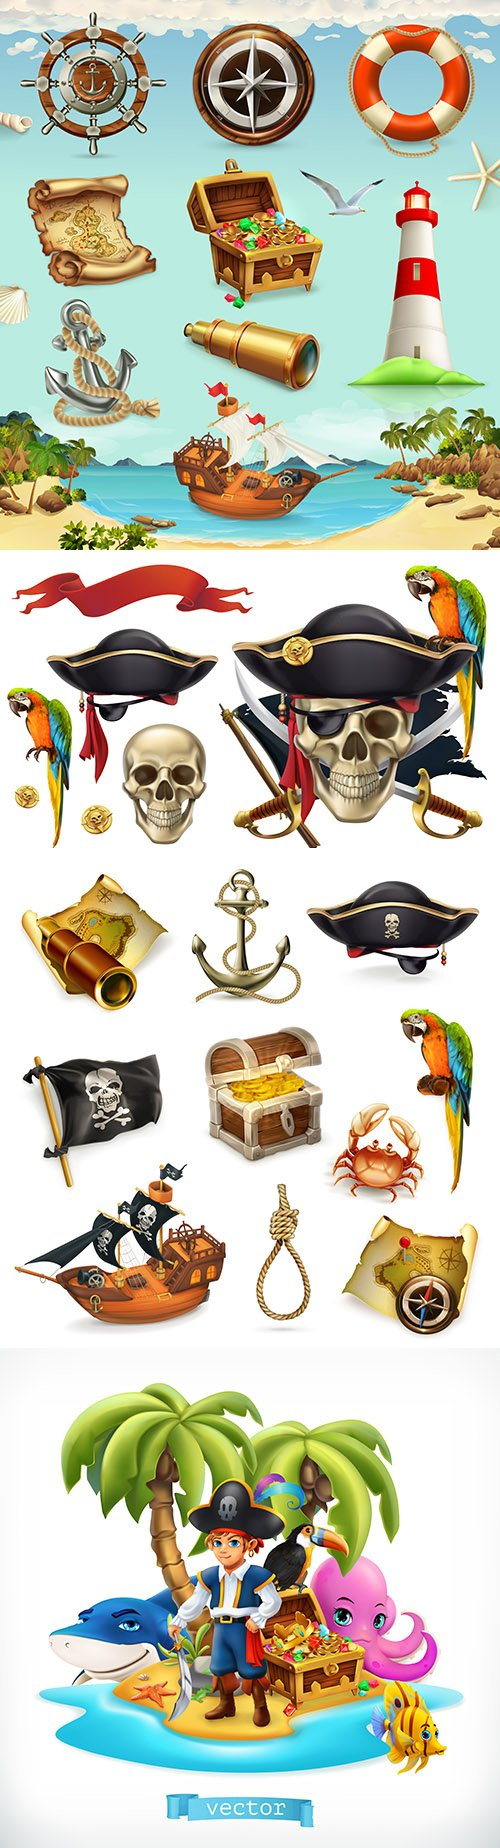 Sea adventure and pirate set vintage items 3d illustration